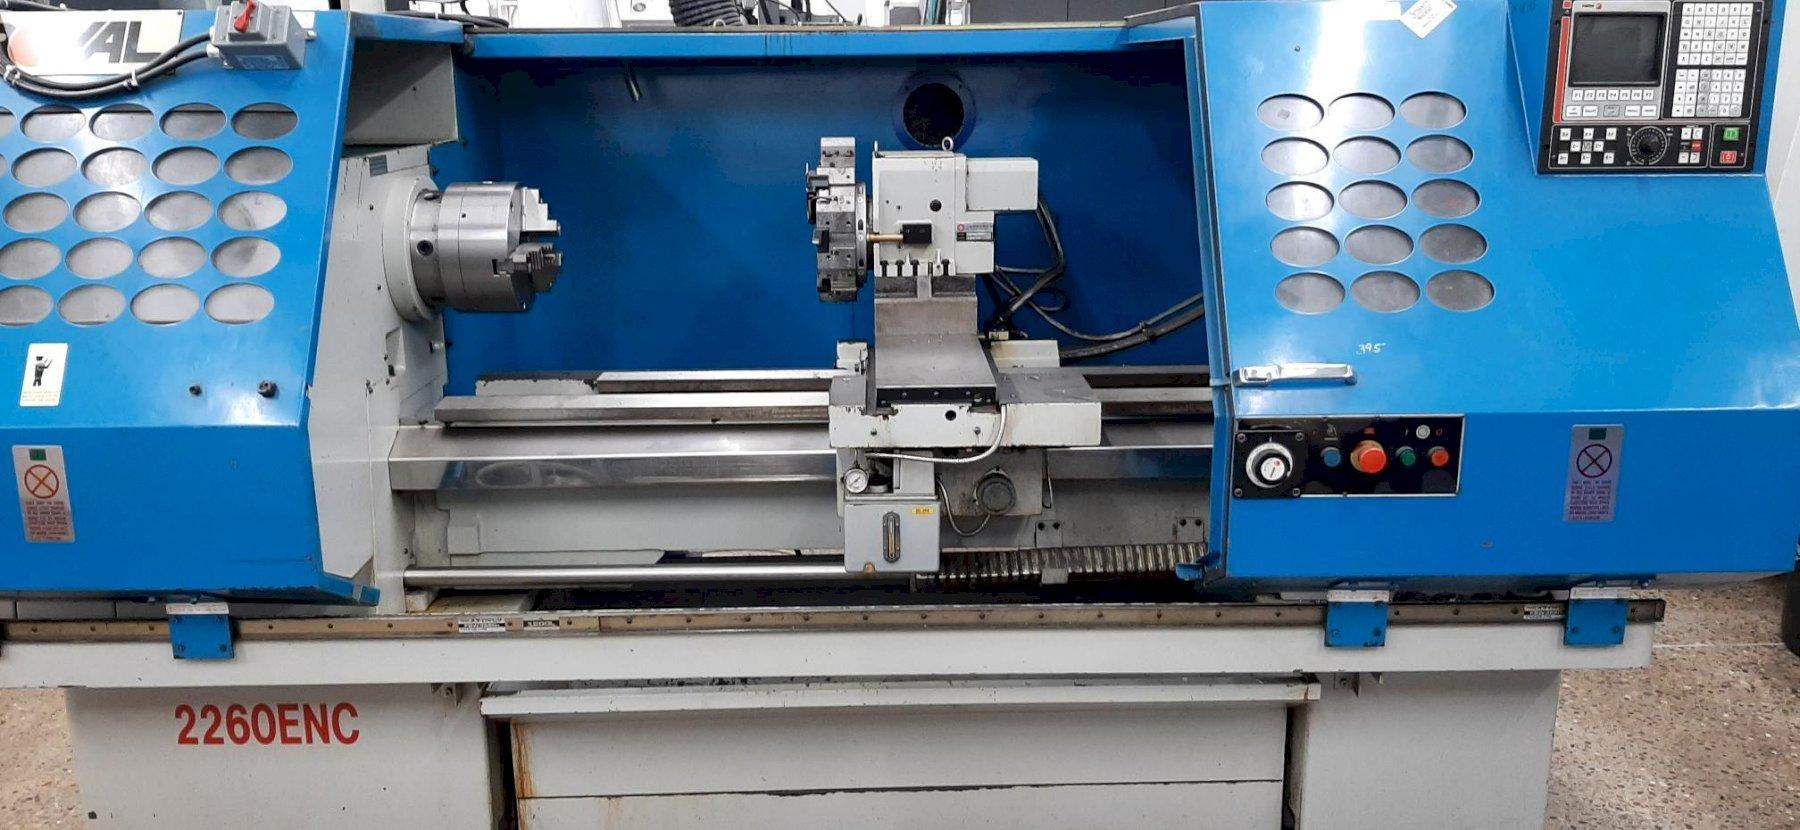 ROYAL (FORTUNE) 2260ENC CNC Flat Engine Lathe